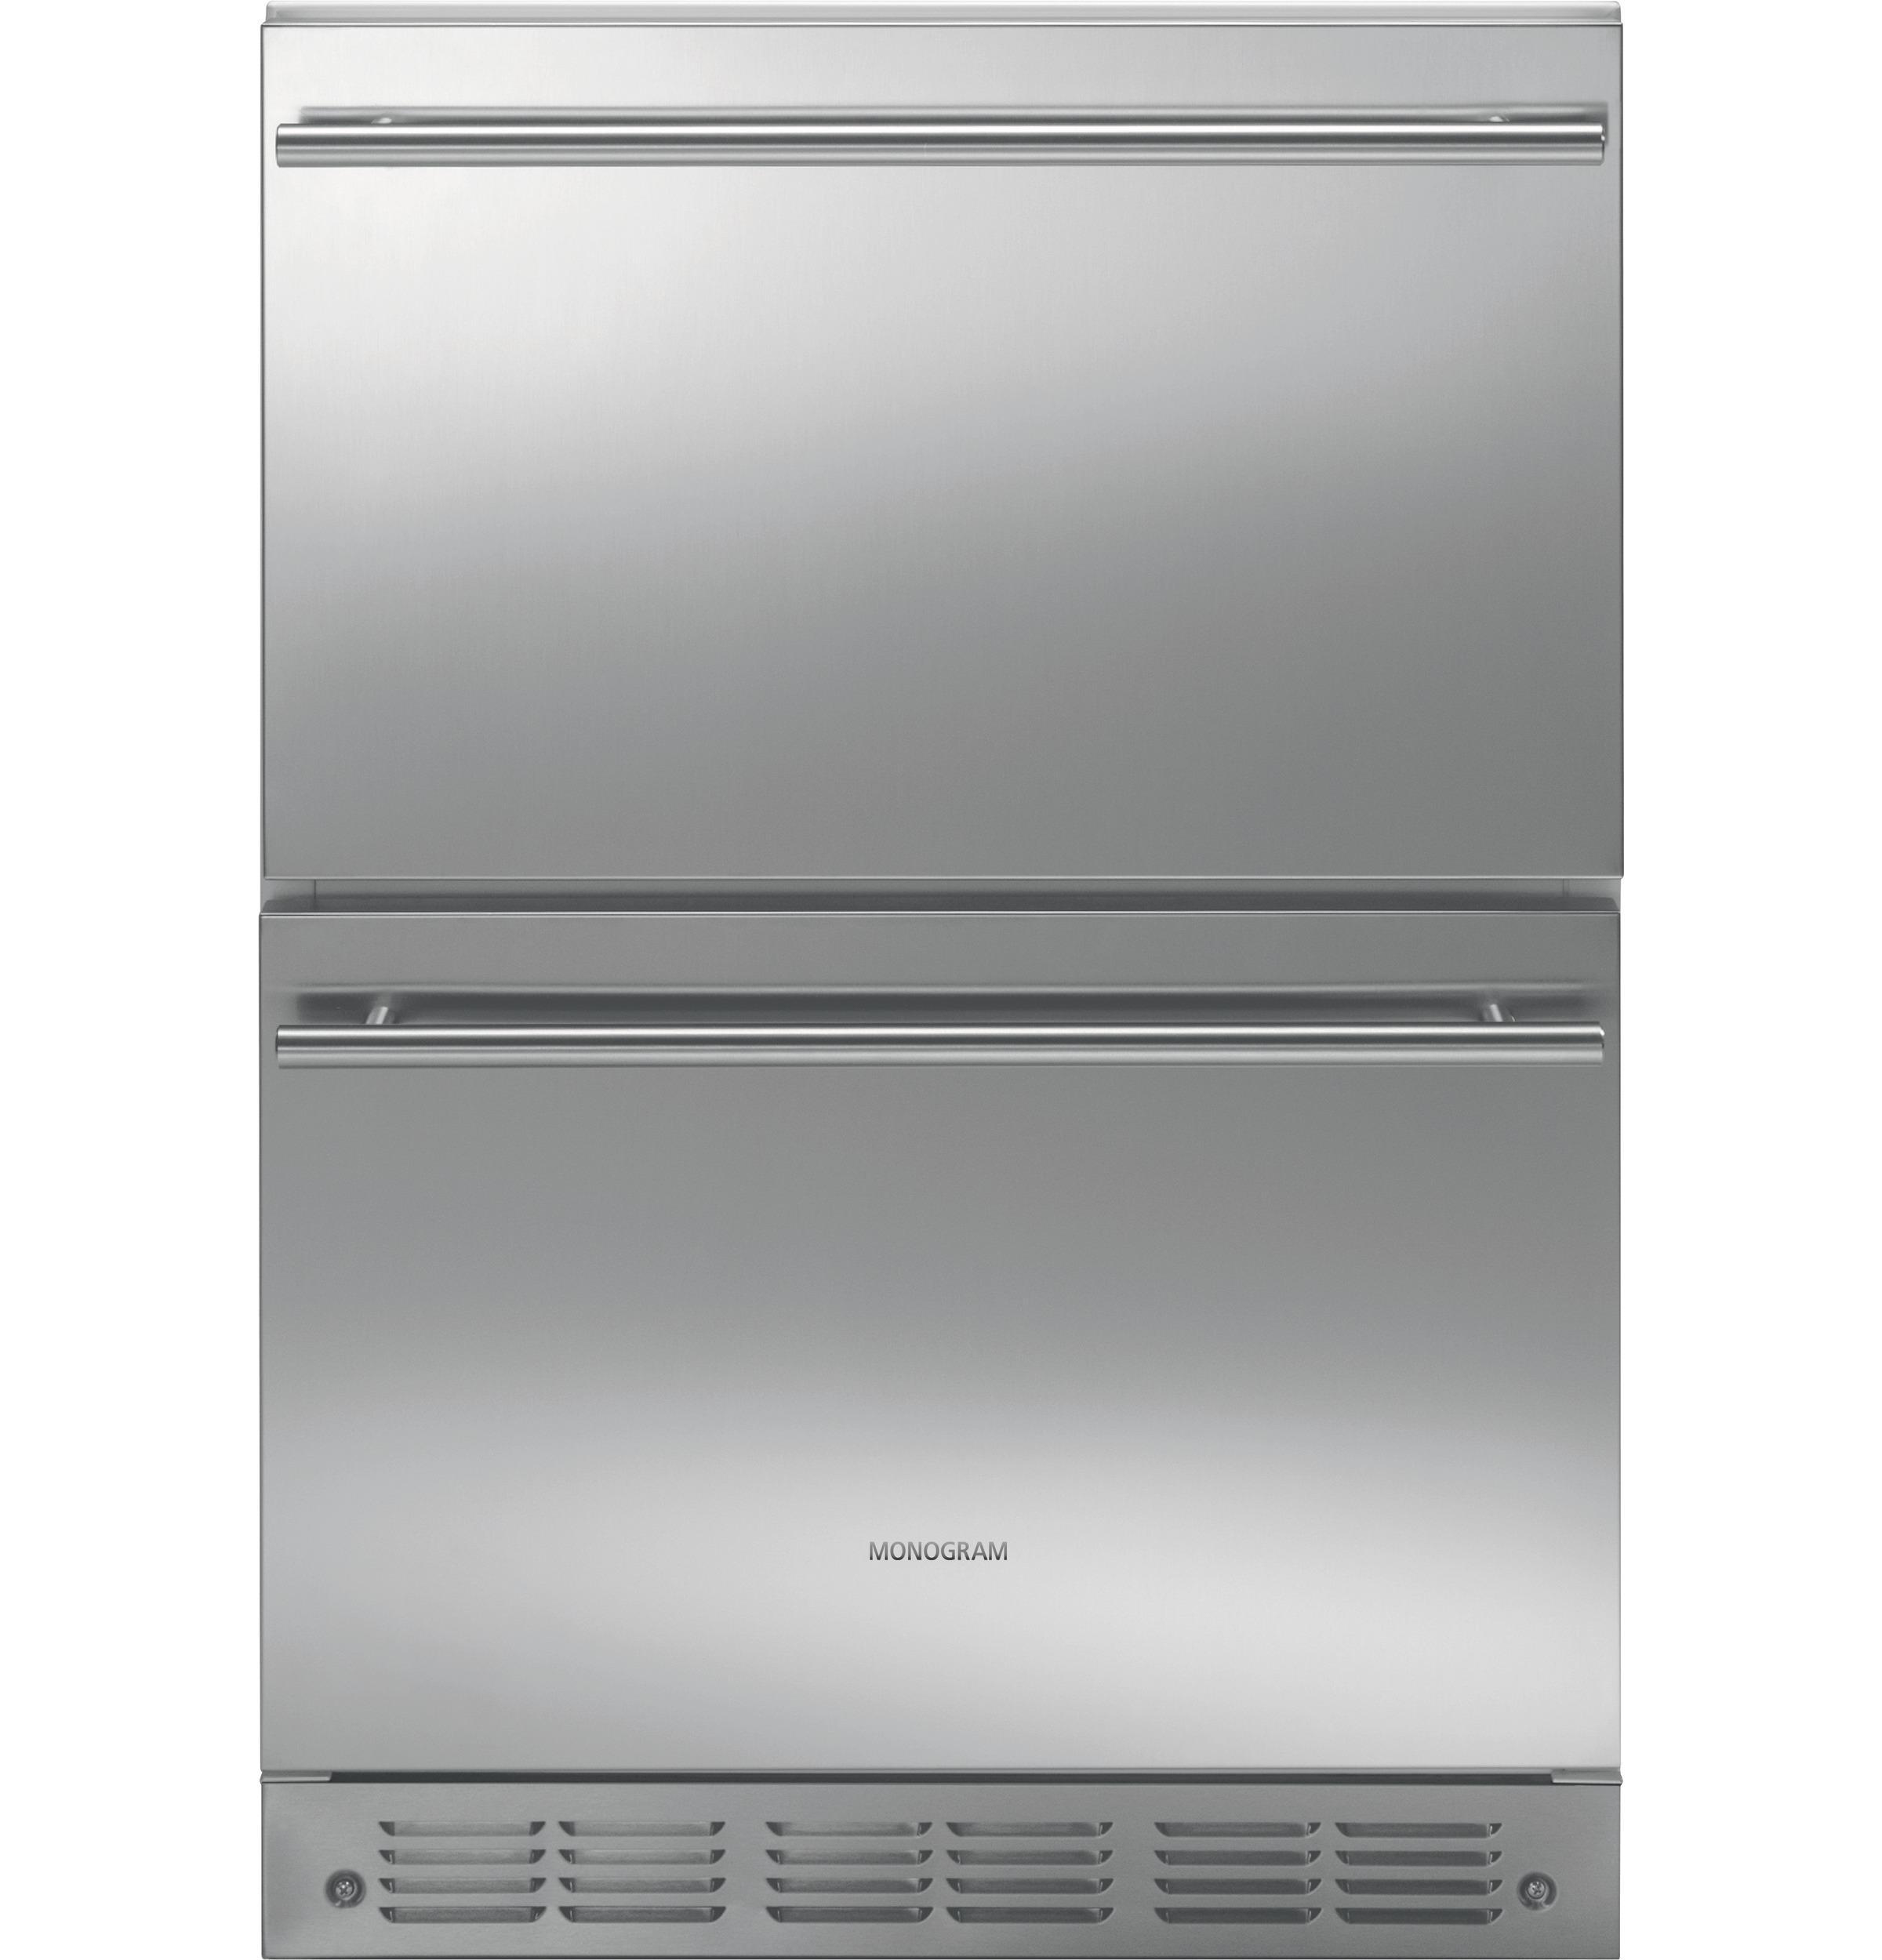 GE MONOGRAMMonogram Double Drawer Refrigerator Module